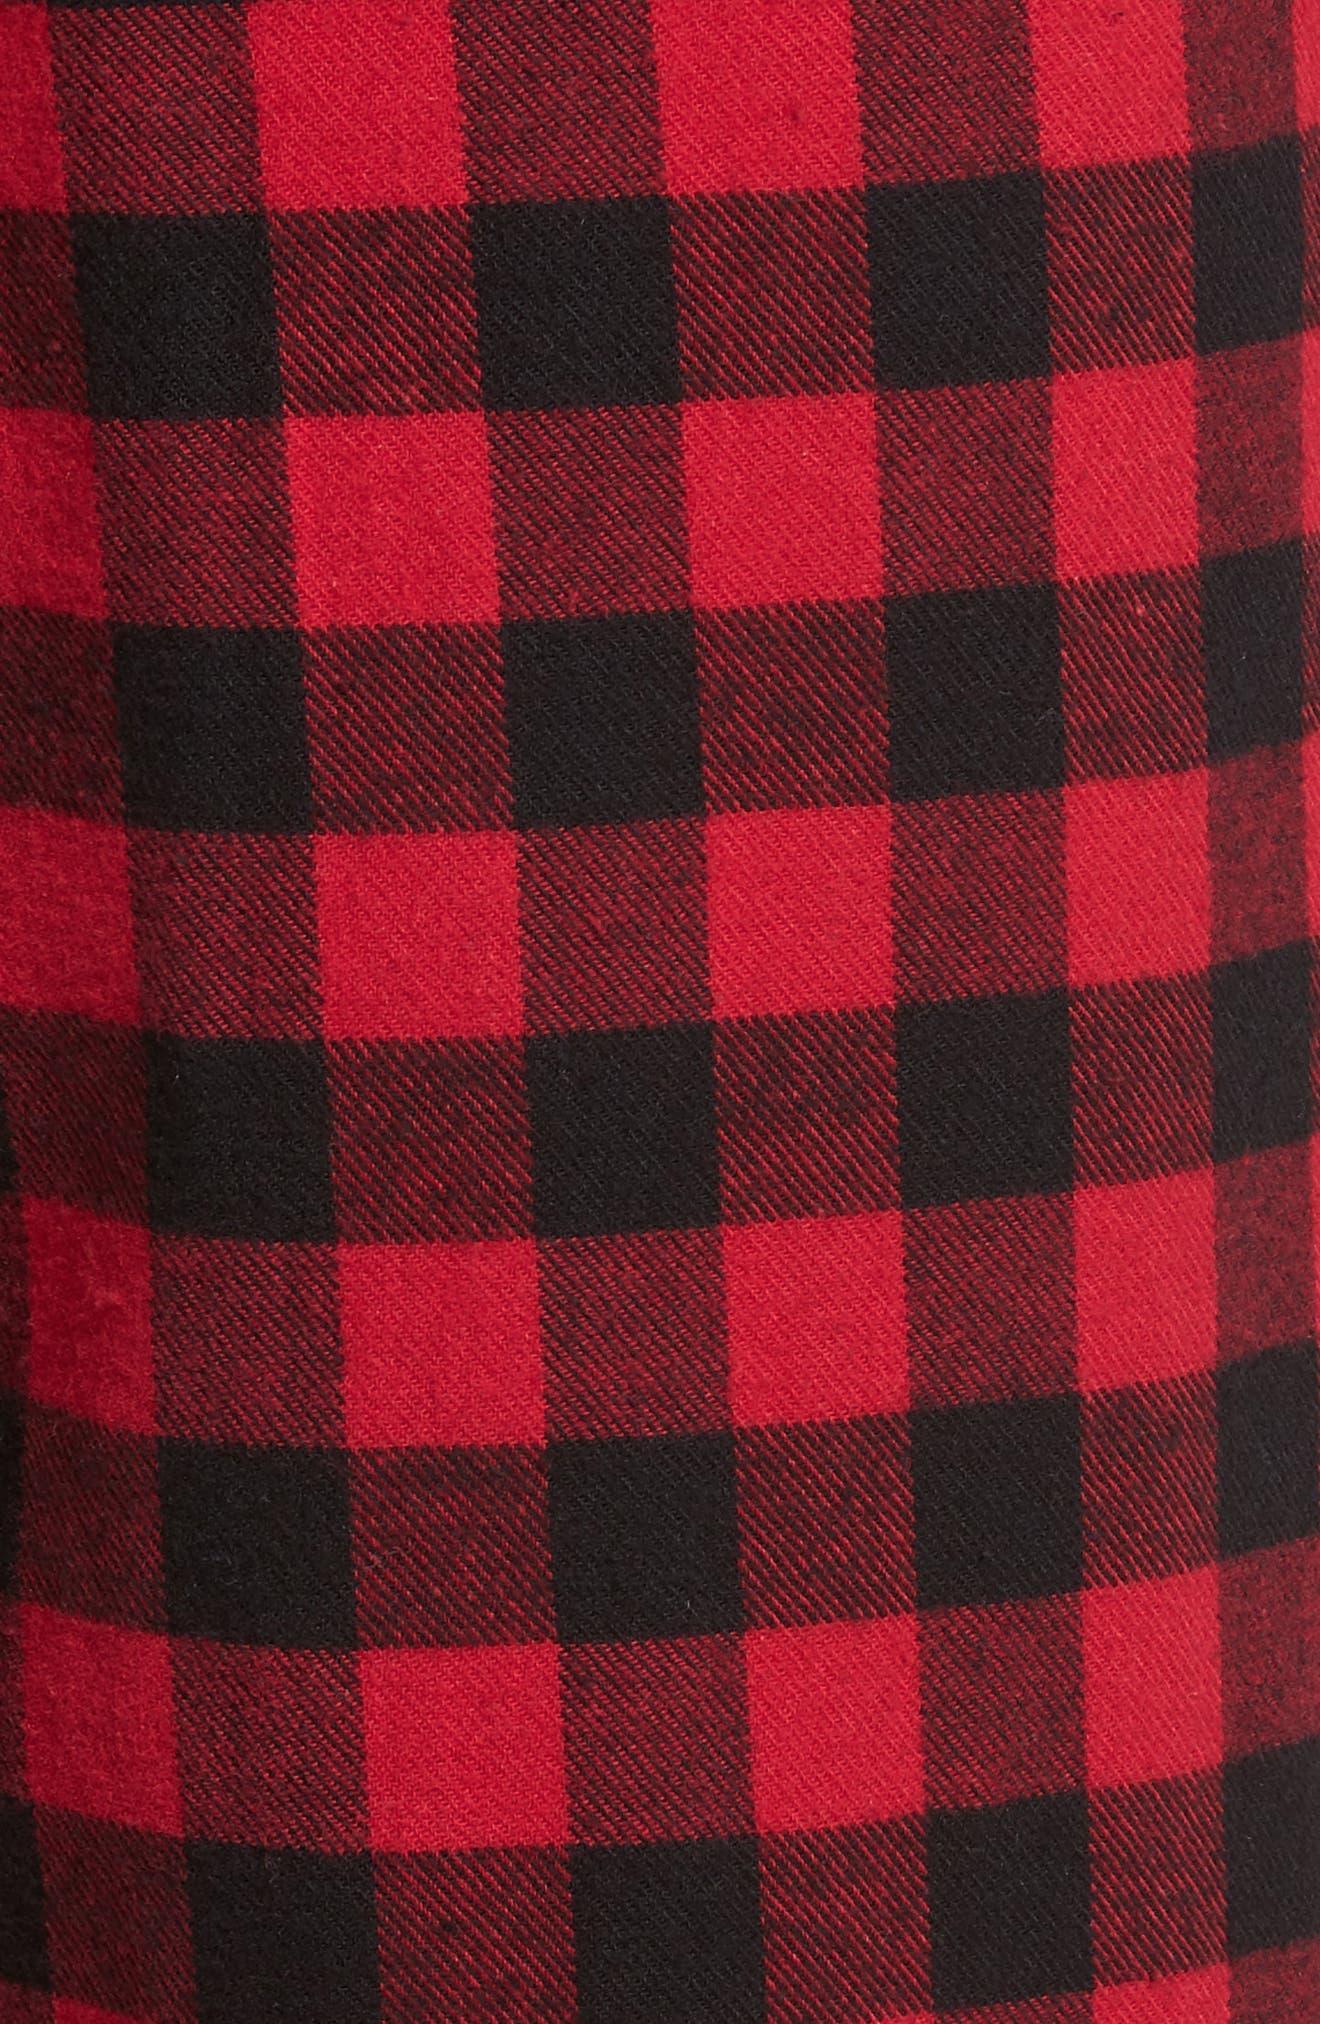 Flannel Pajama Pants,                             Alternate thumbnail 5, color,                             RED CHILI- BLACK BUFFALO